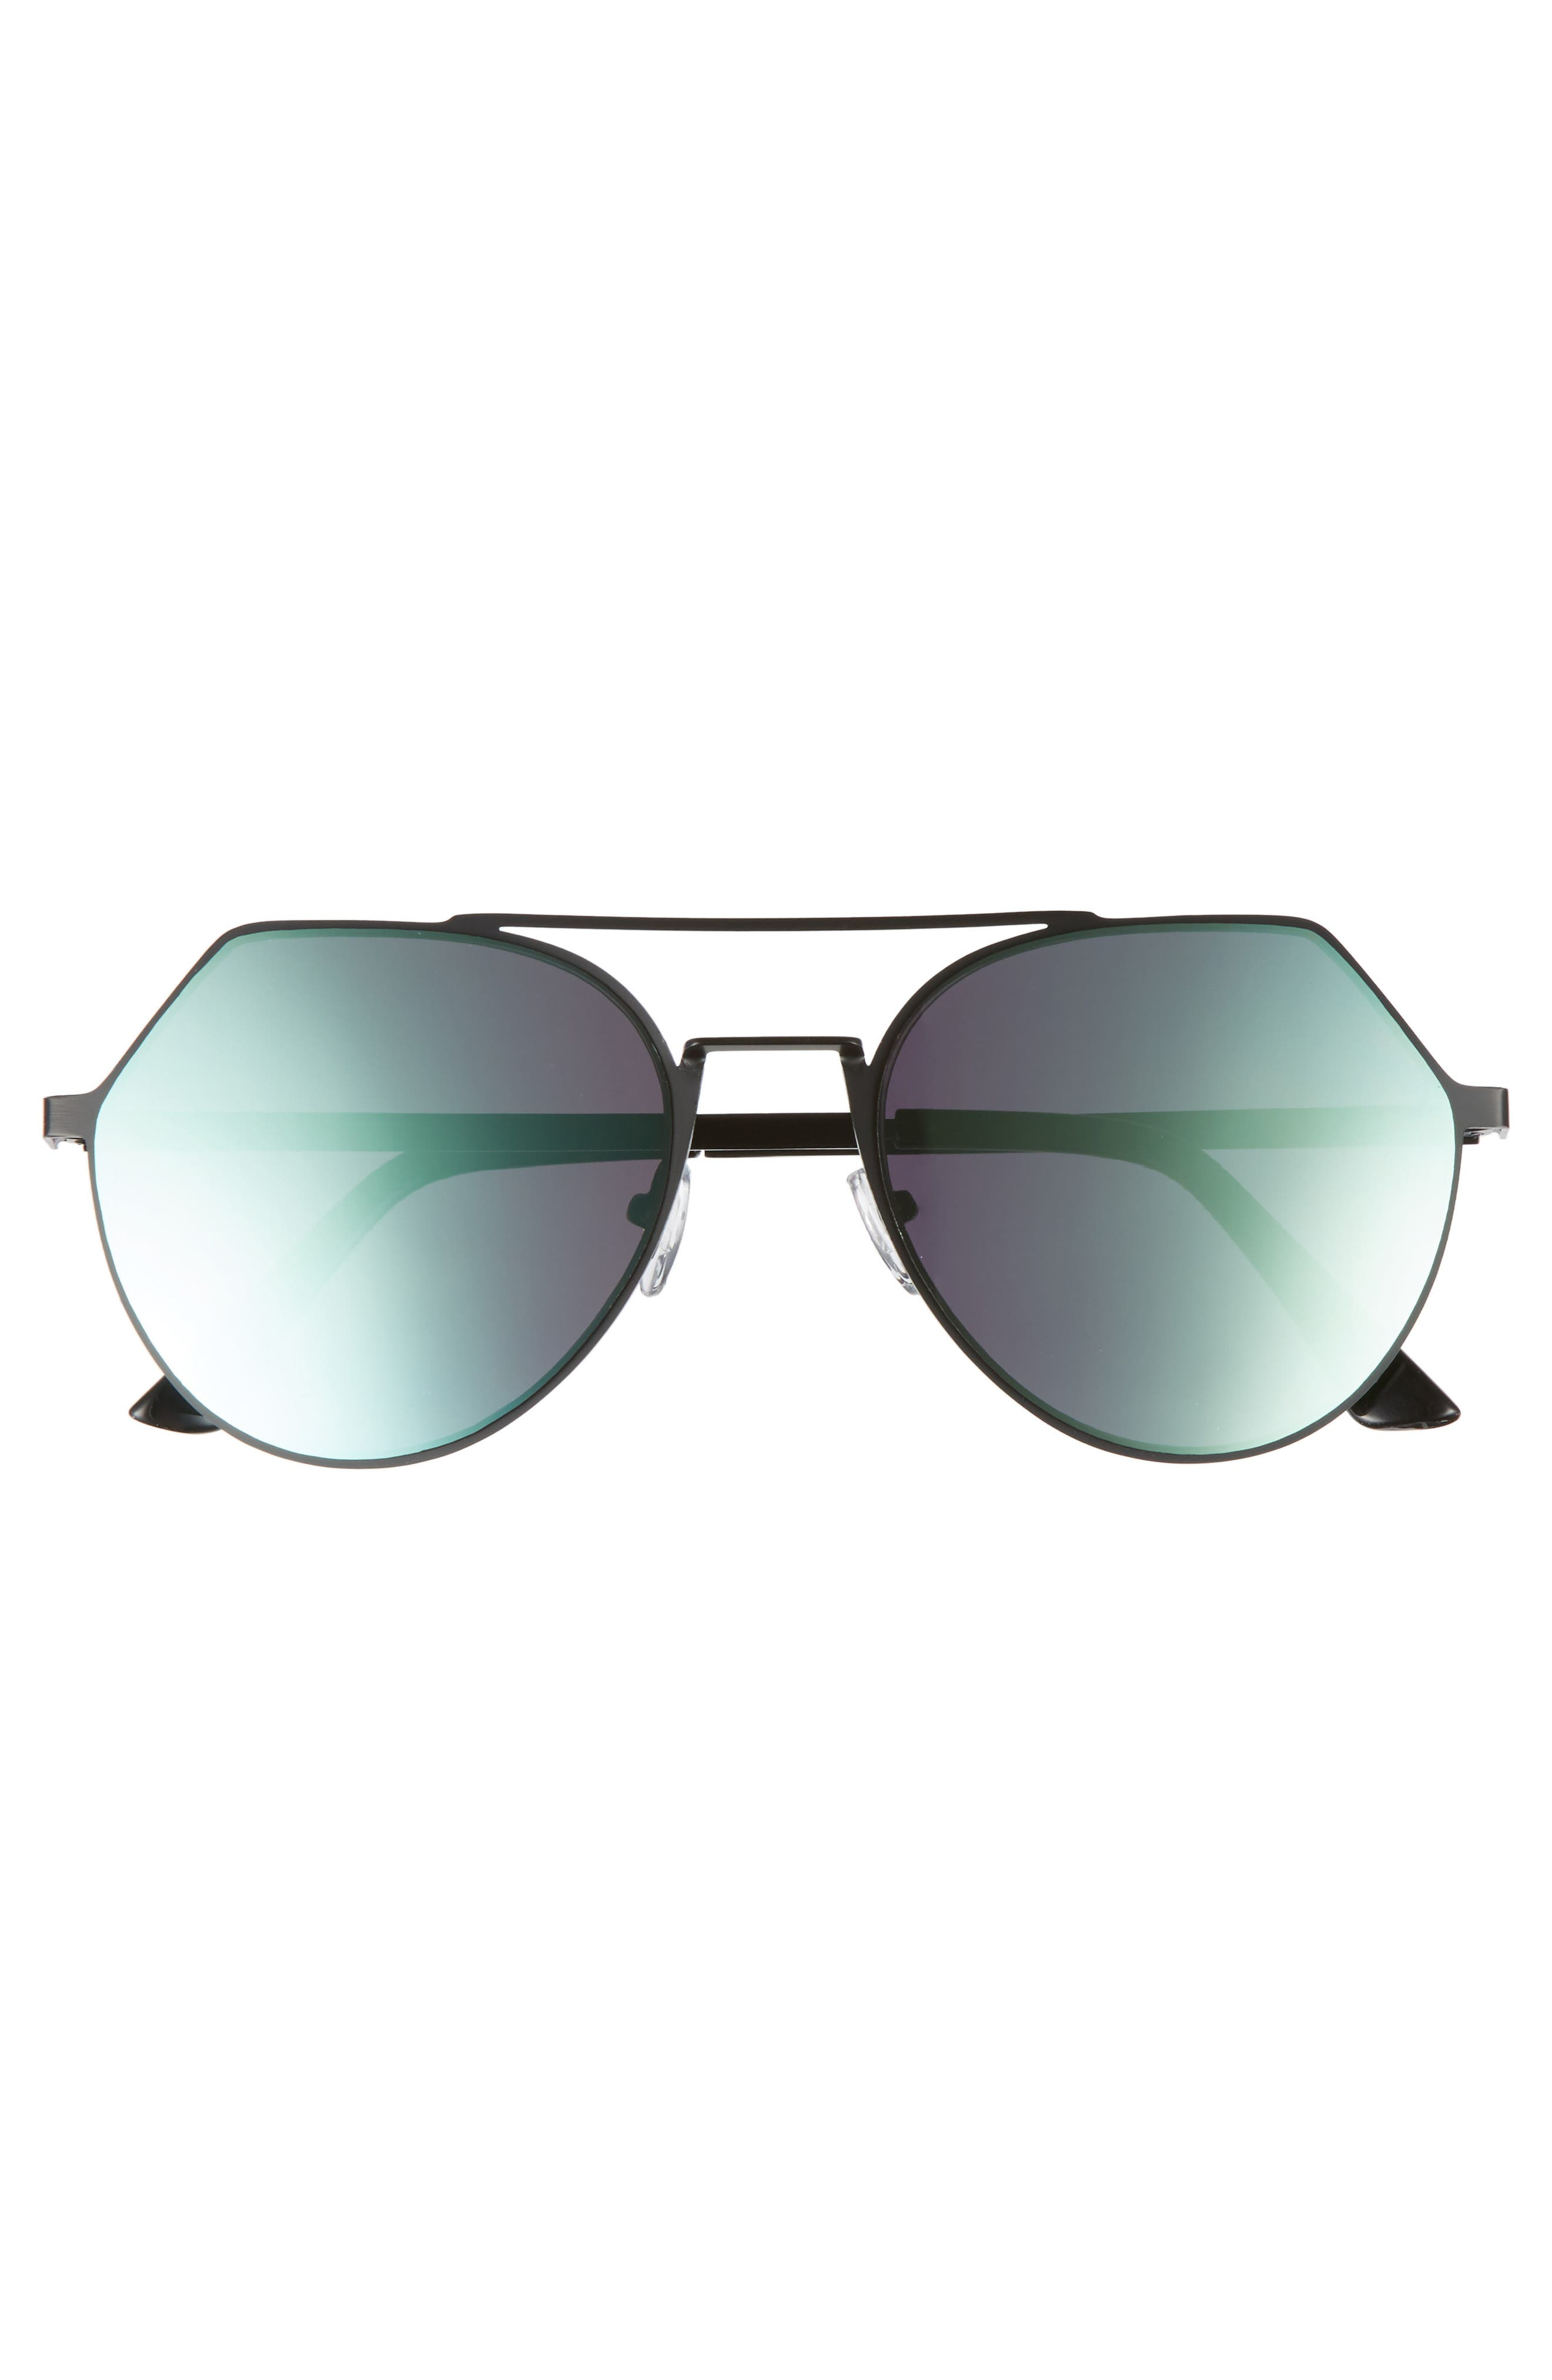 Mirrored Aviator Sunglasses,                             Alternate thumbnail 3, color,                             001